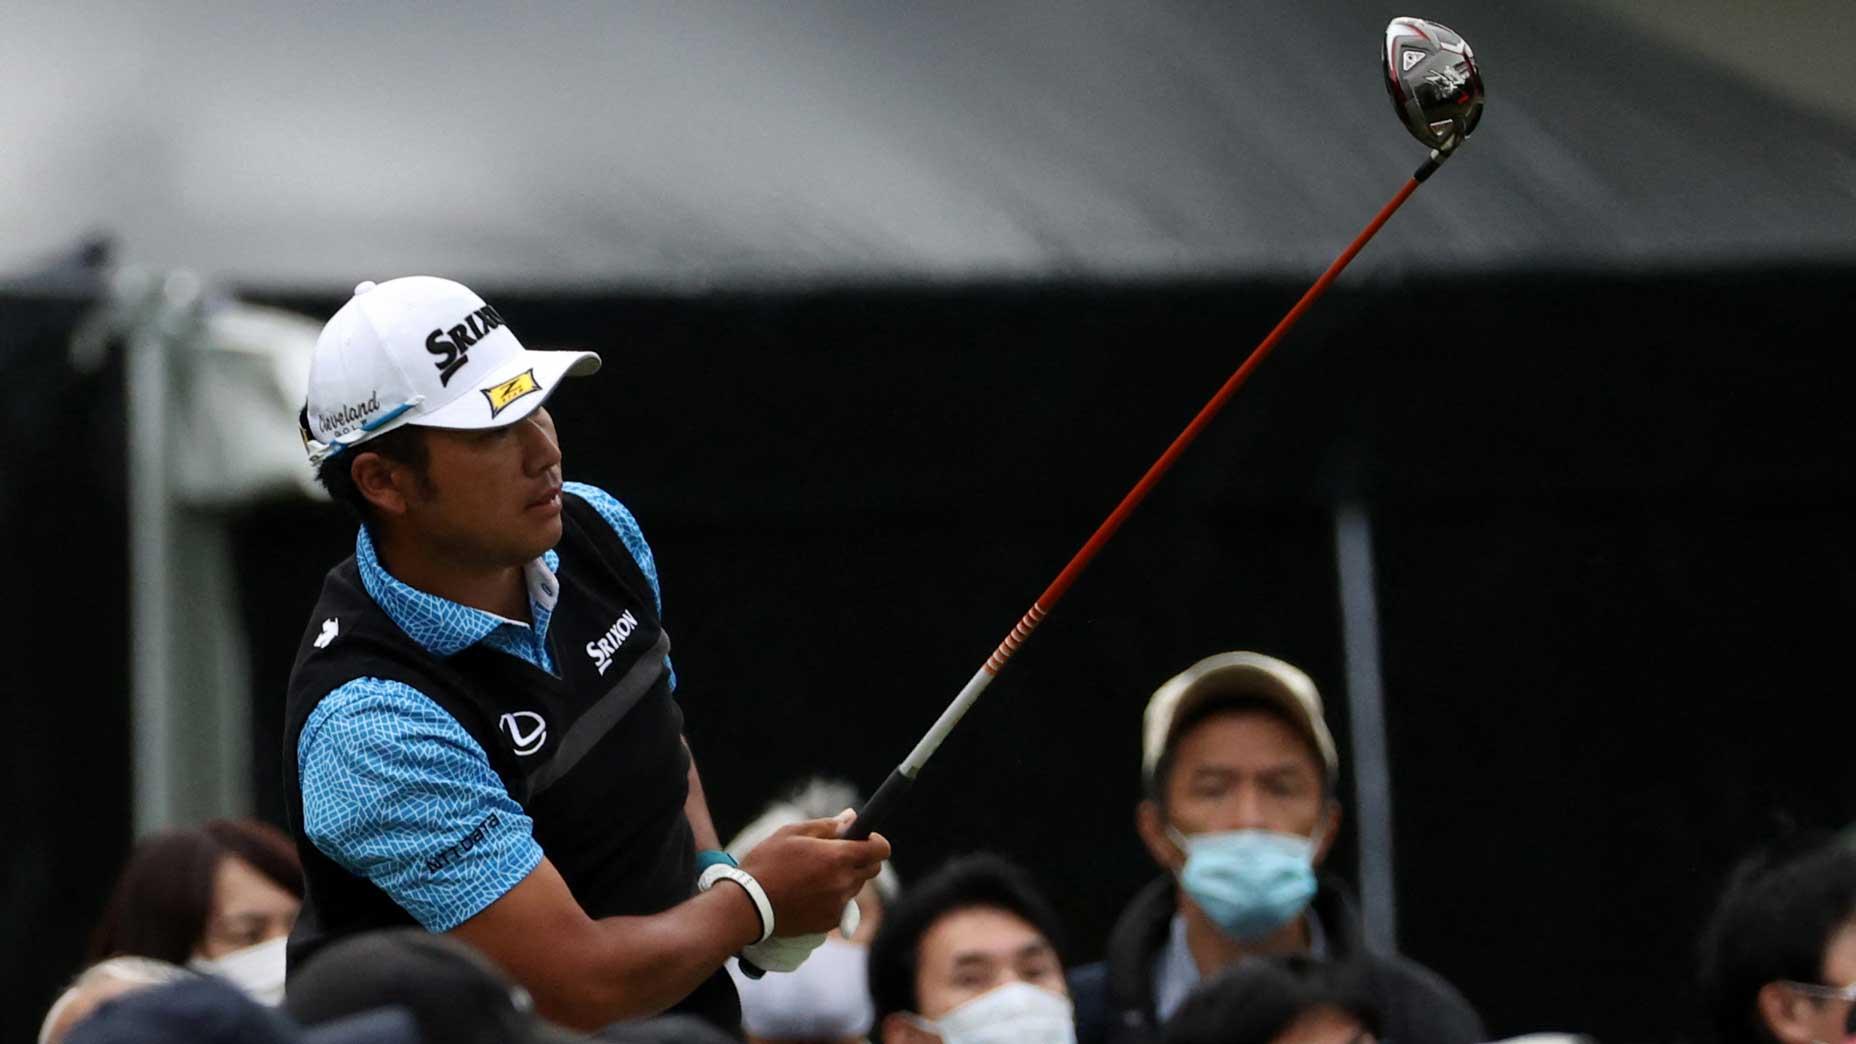 Hideki Matsuyama tees off amid large crowds in Round 1 at the 2021 Zozo Championship